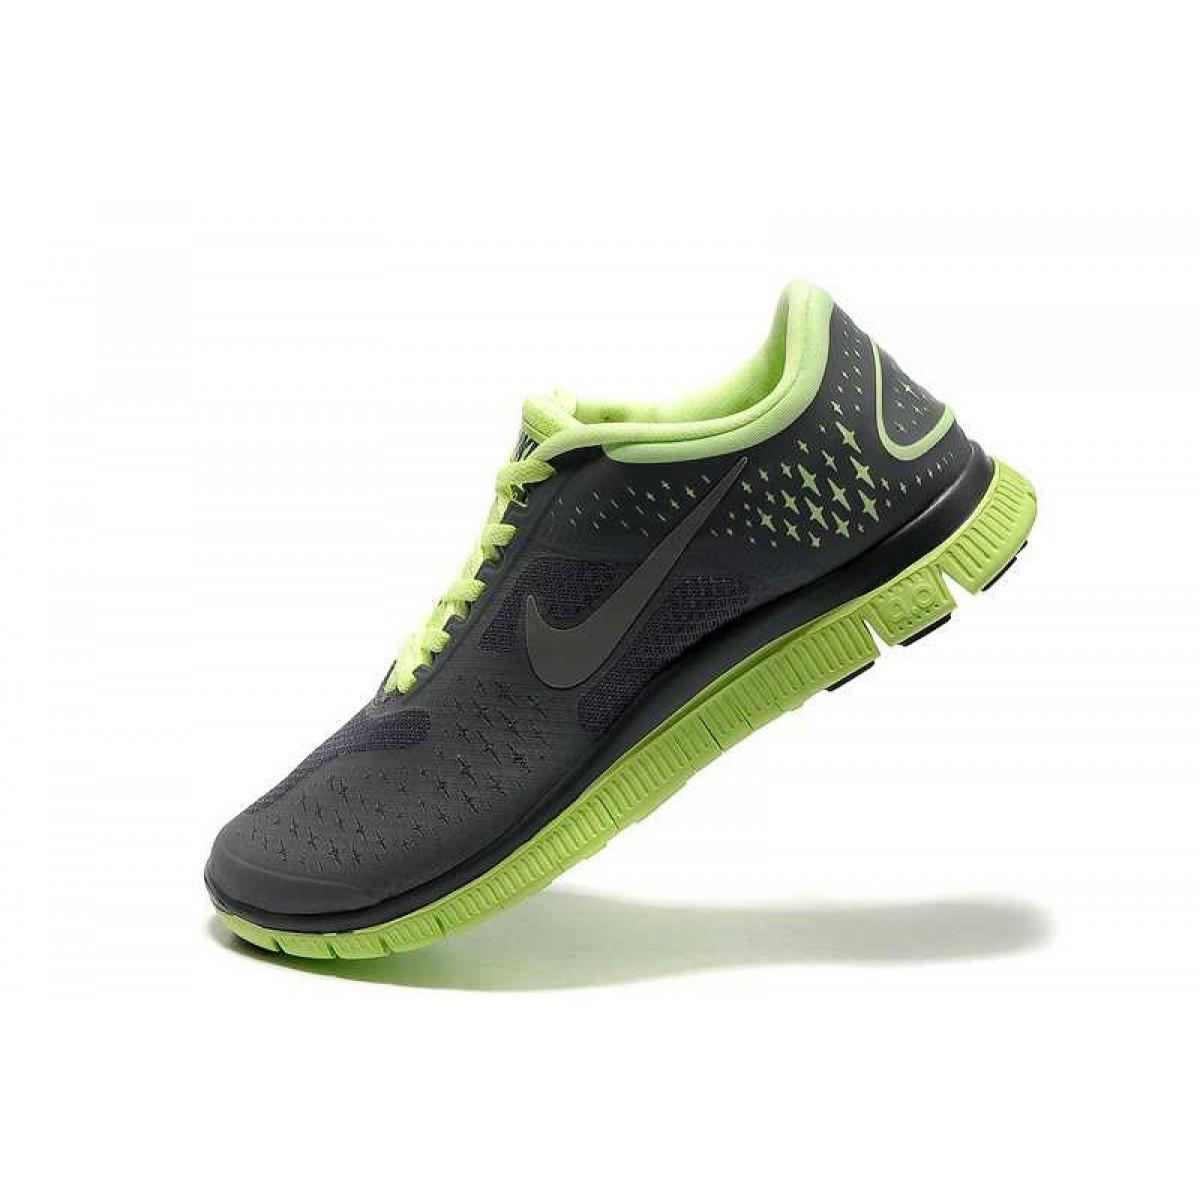 separation shoes 57bff 22216 Homme Nike Free 4.0 V2 Chaussures Gris Vert,nike free 5,styles dernier cri